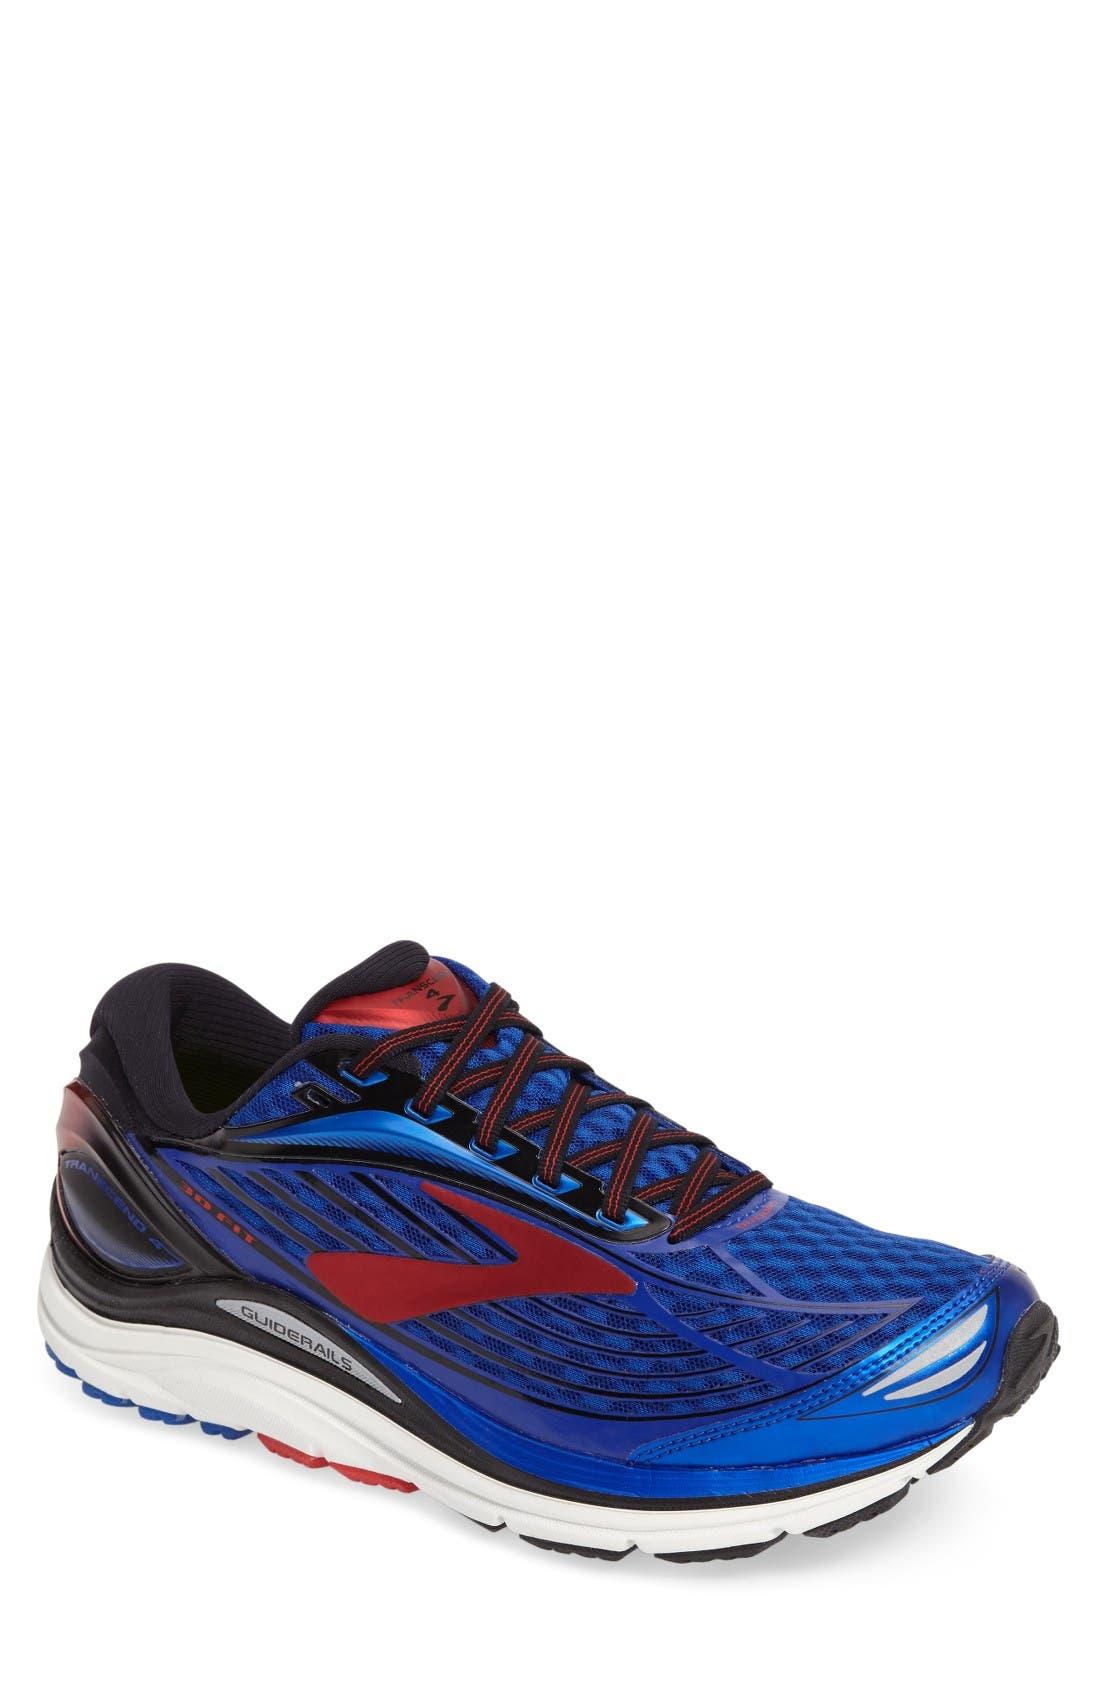 Main Image - Brooks Transcend 4 Running Shoe (Men)